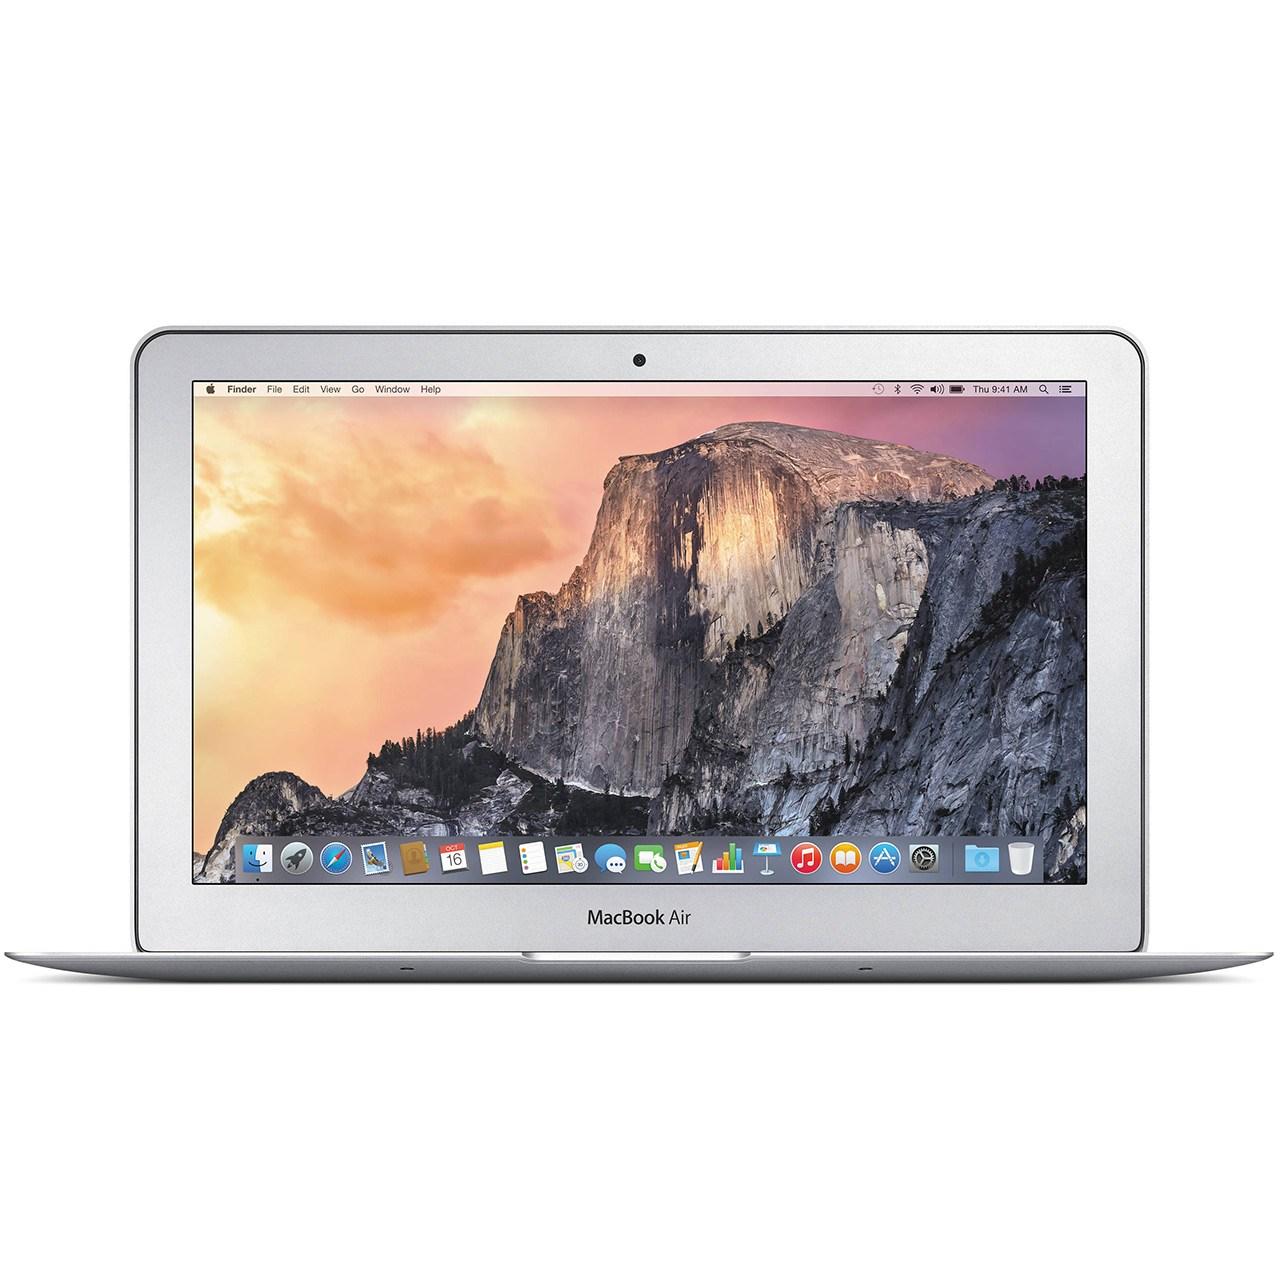 لپ تاپ 13 اینچی اپل مدل MacBook Air MJVE2 2015